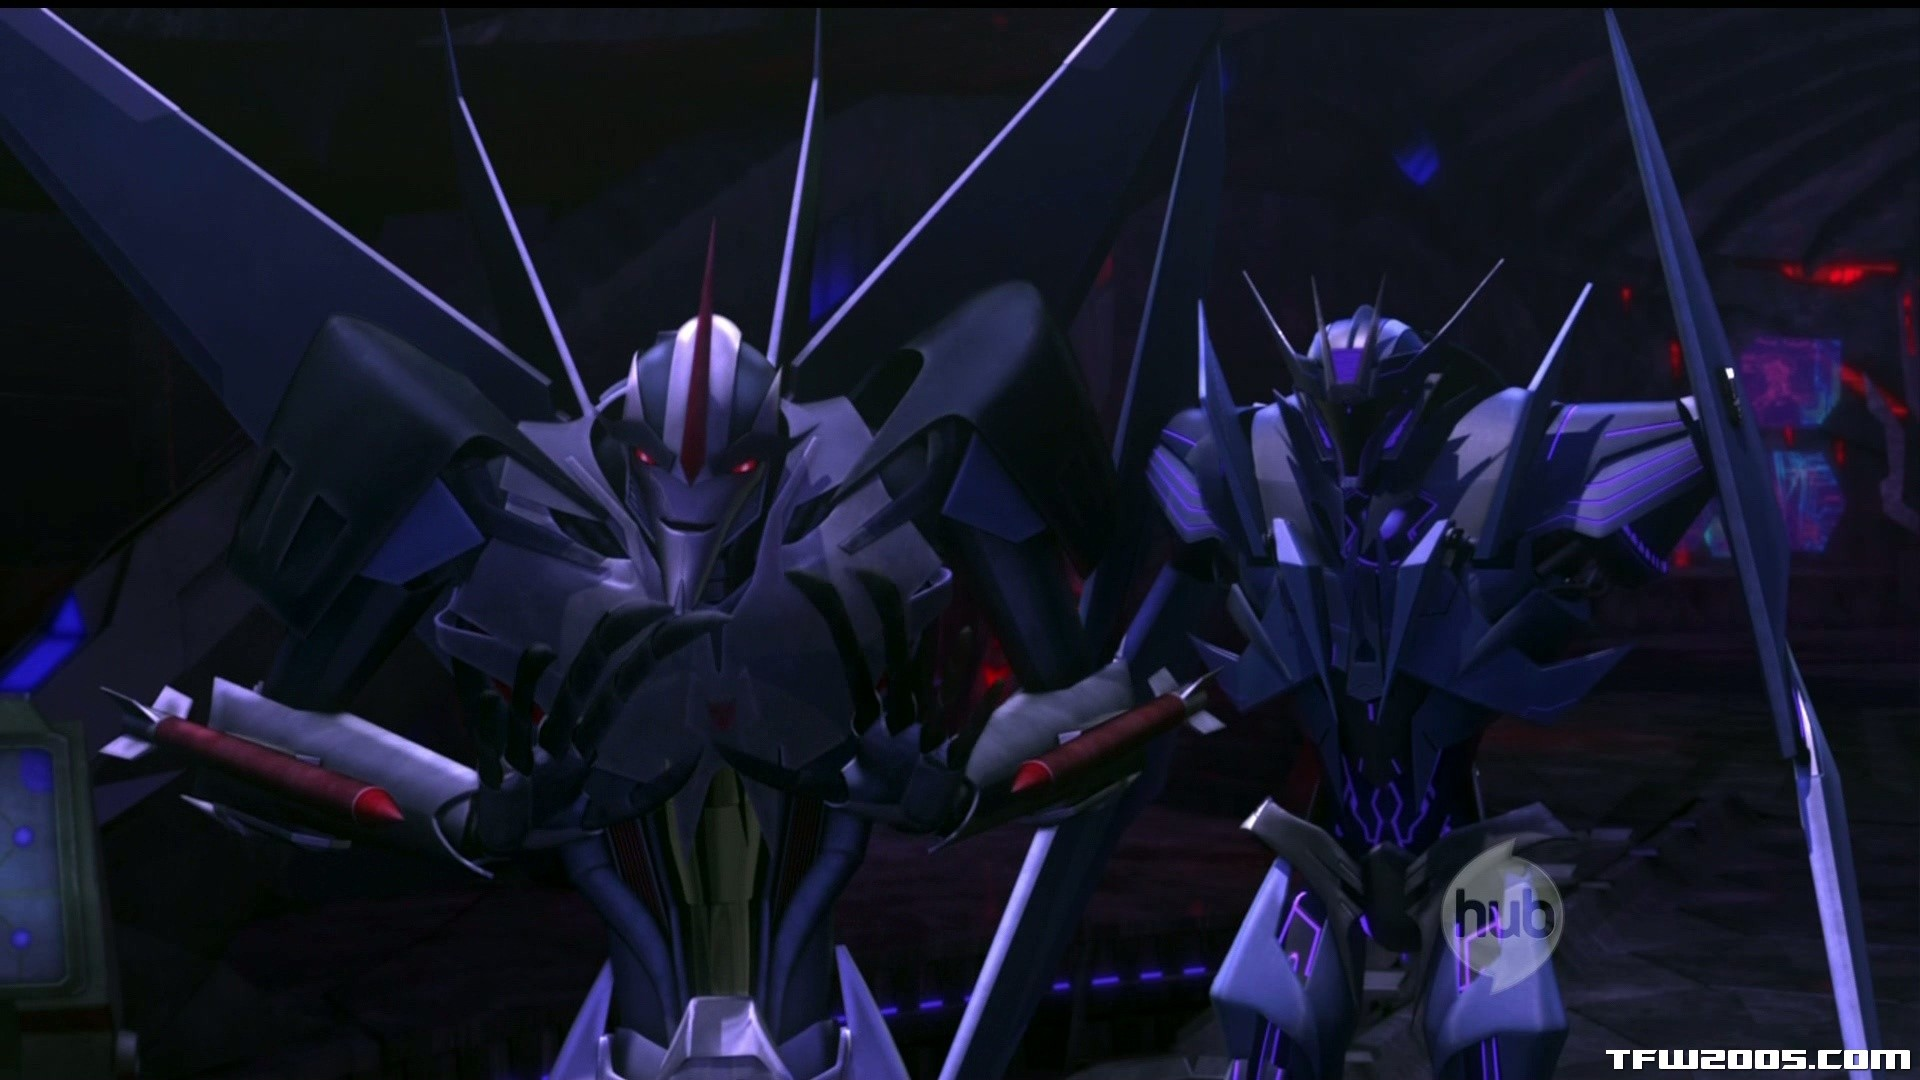 Starscream wallpapers 68 pictures - Transformers prime wallpaper ...